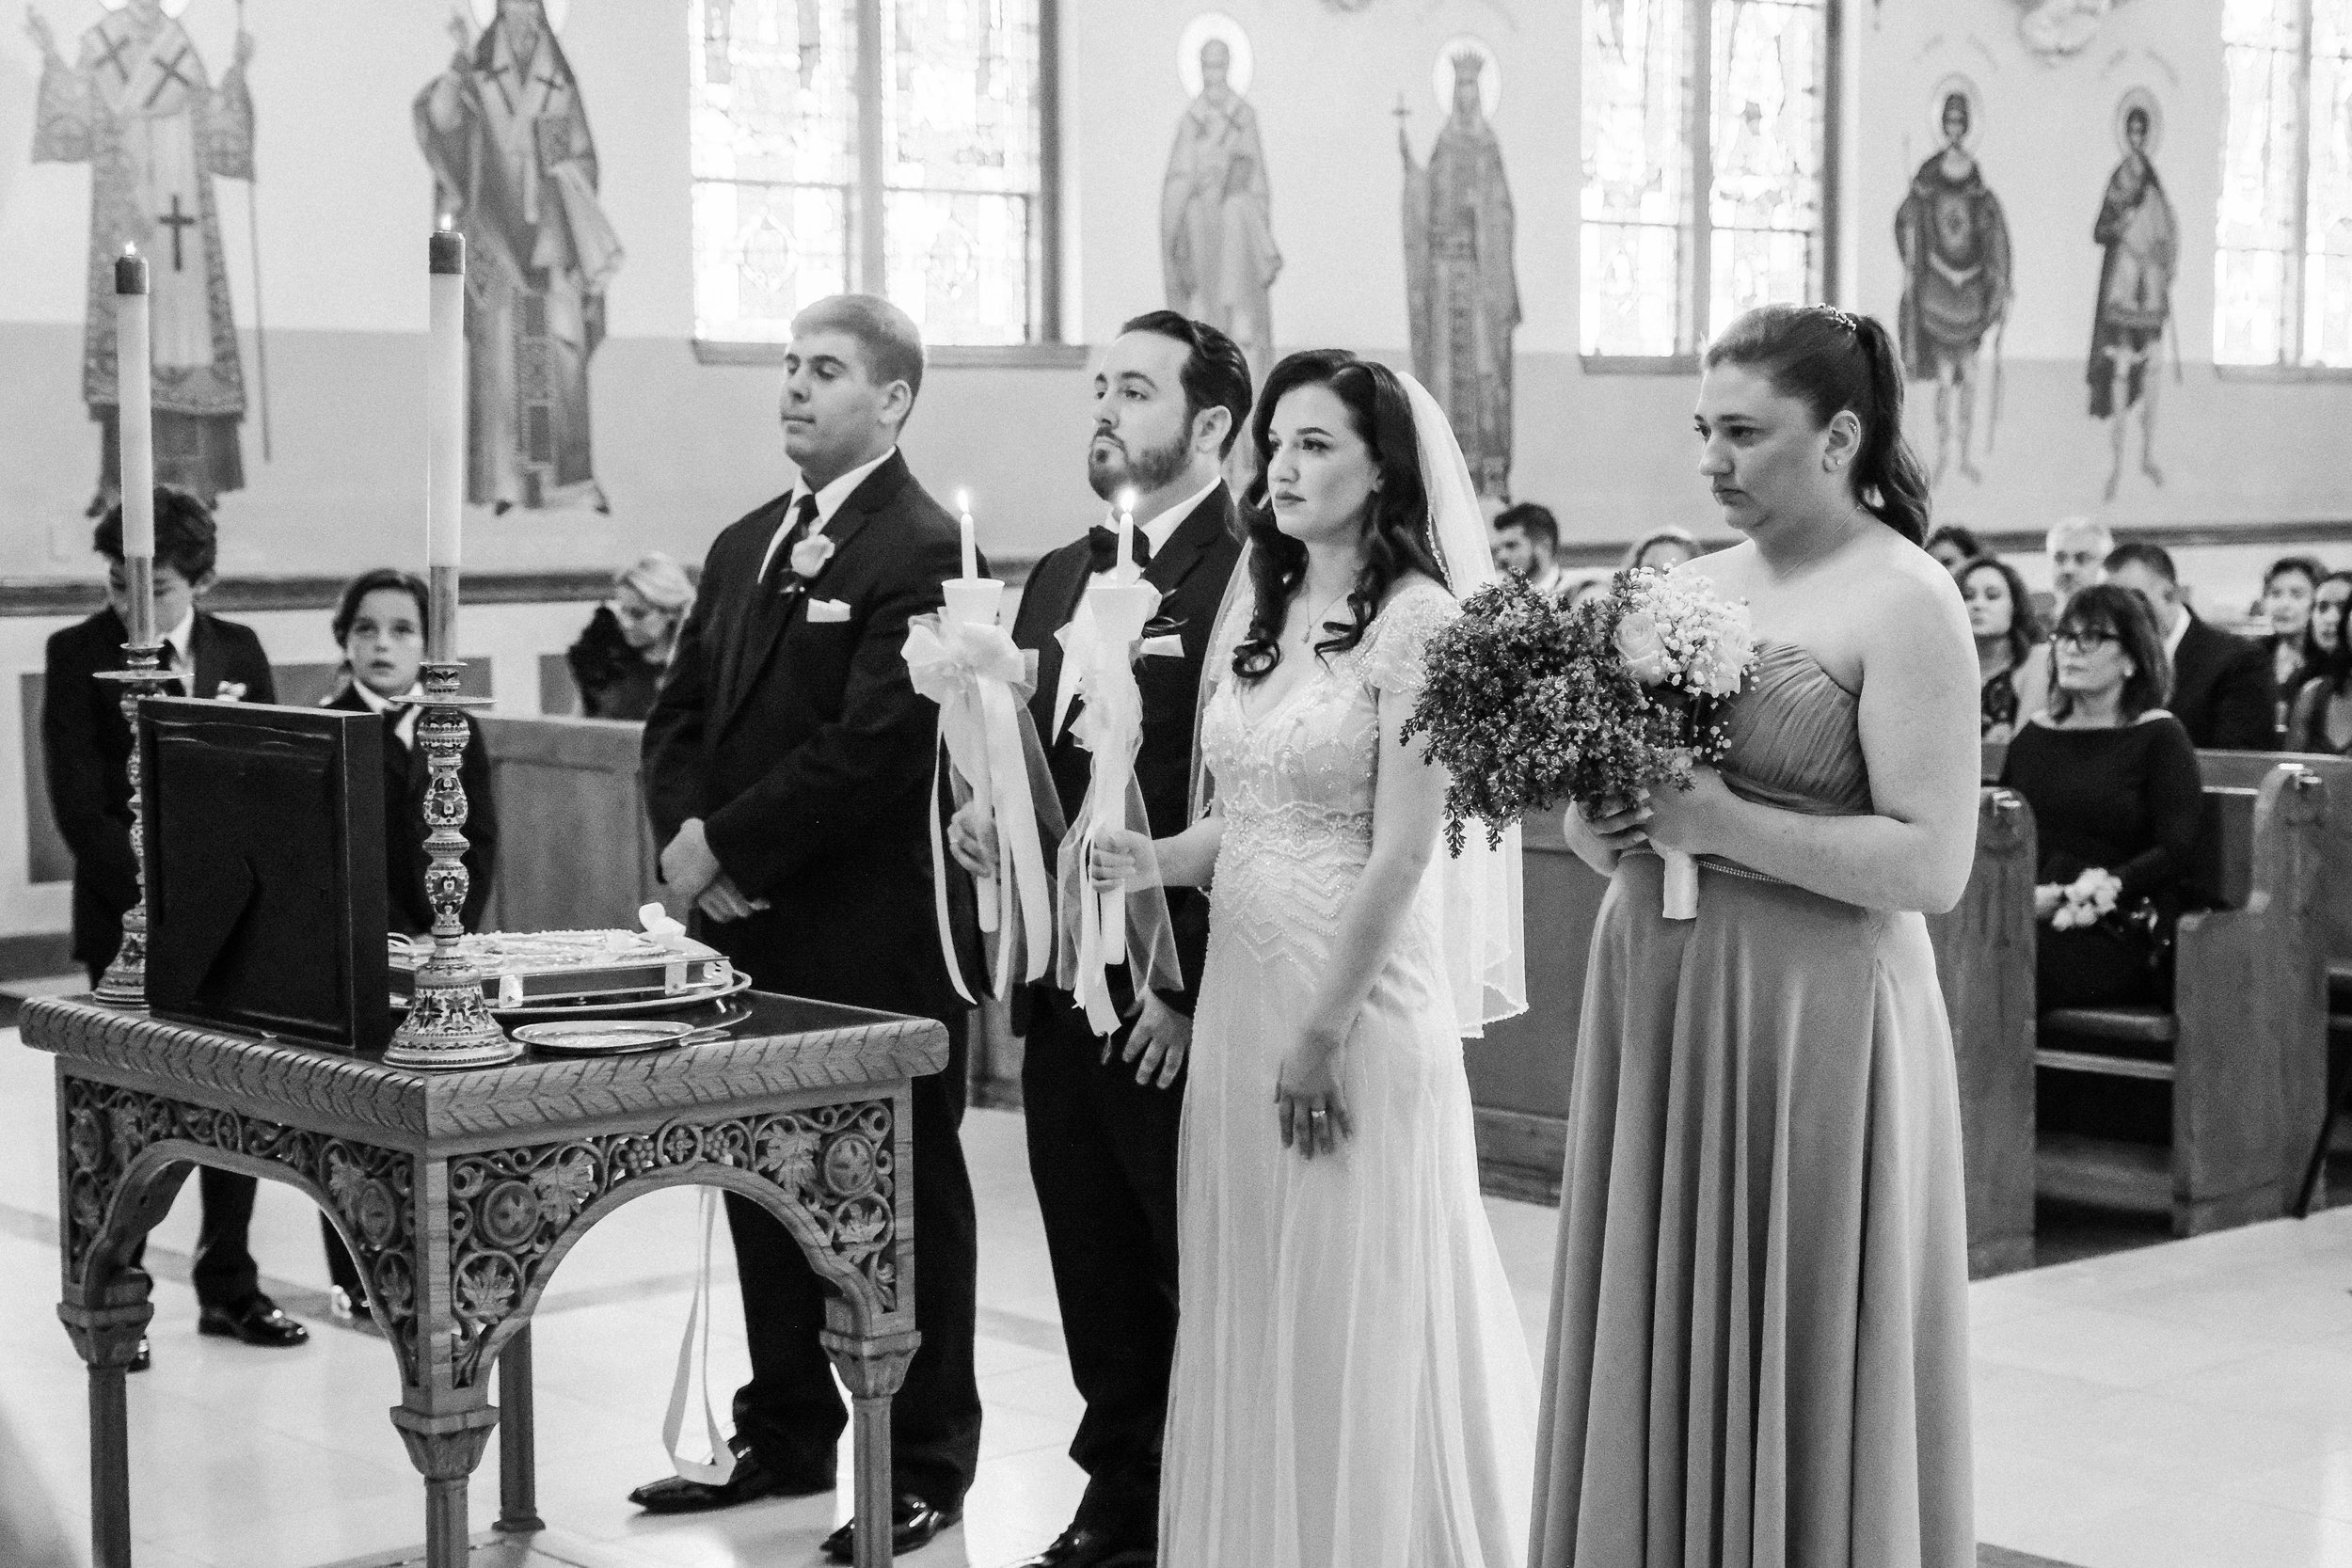 lyman-estate-wedding-photography-26.jpg